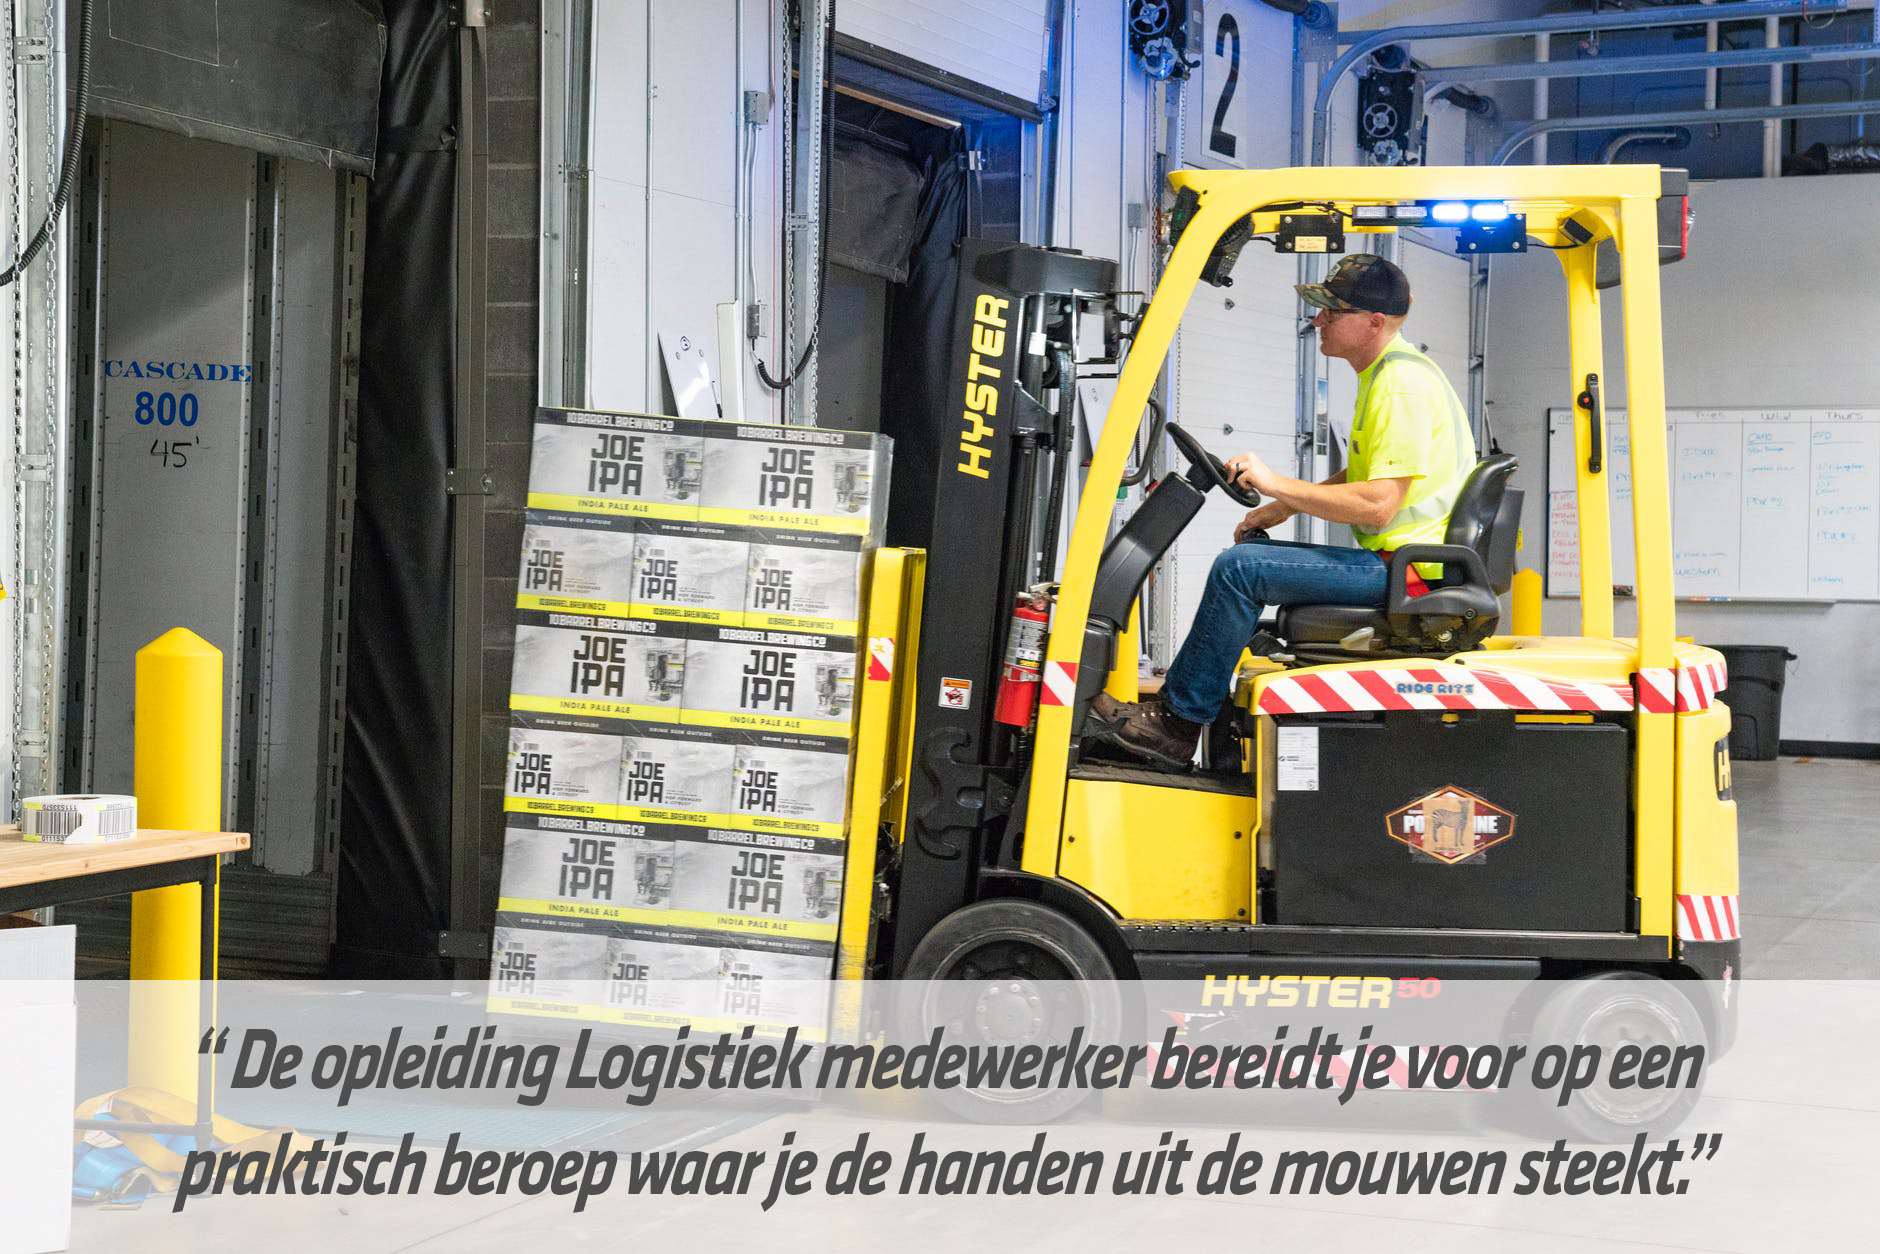 Mbo-opleiding logistiek medewerker | STC mbo college Rotterdam